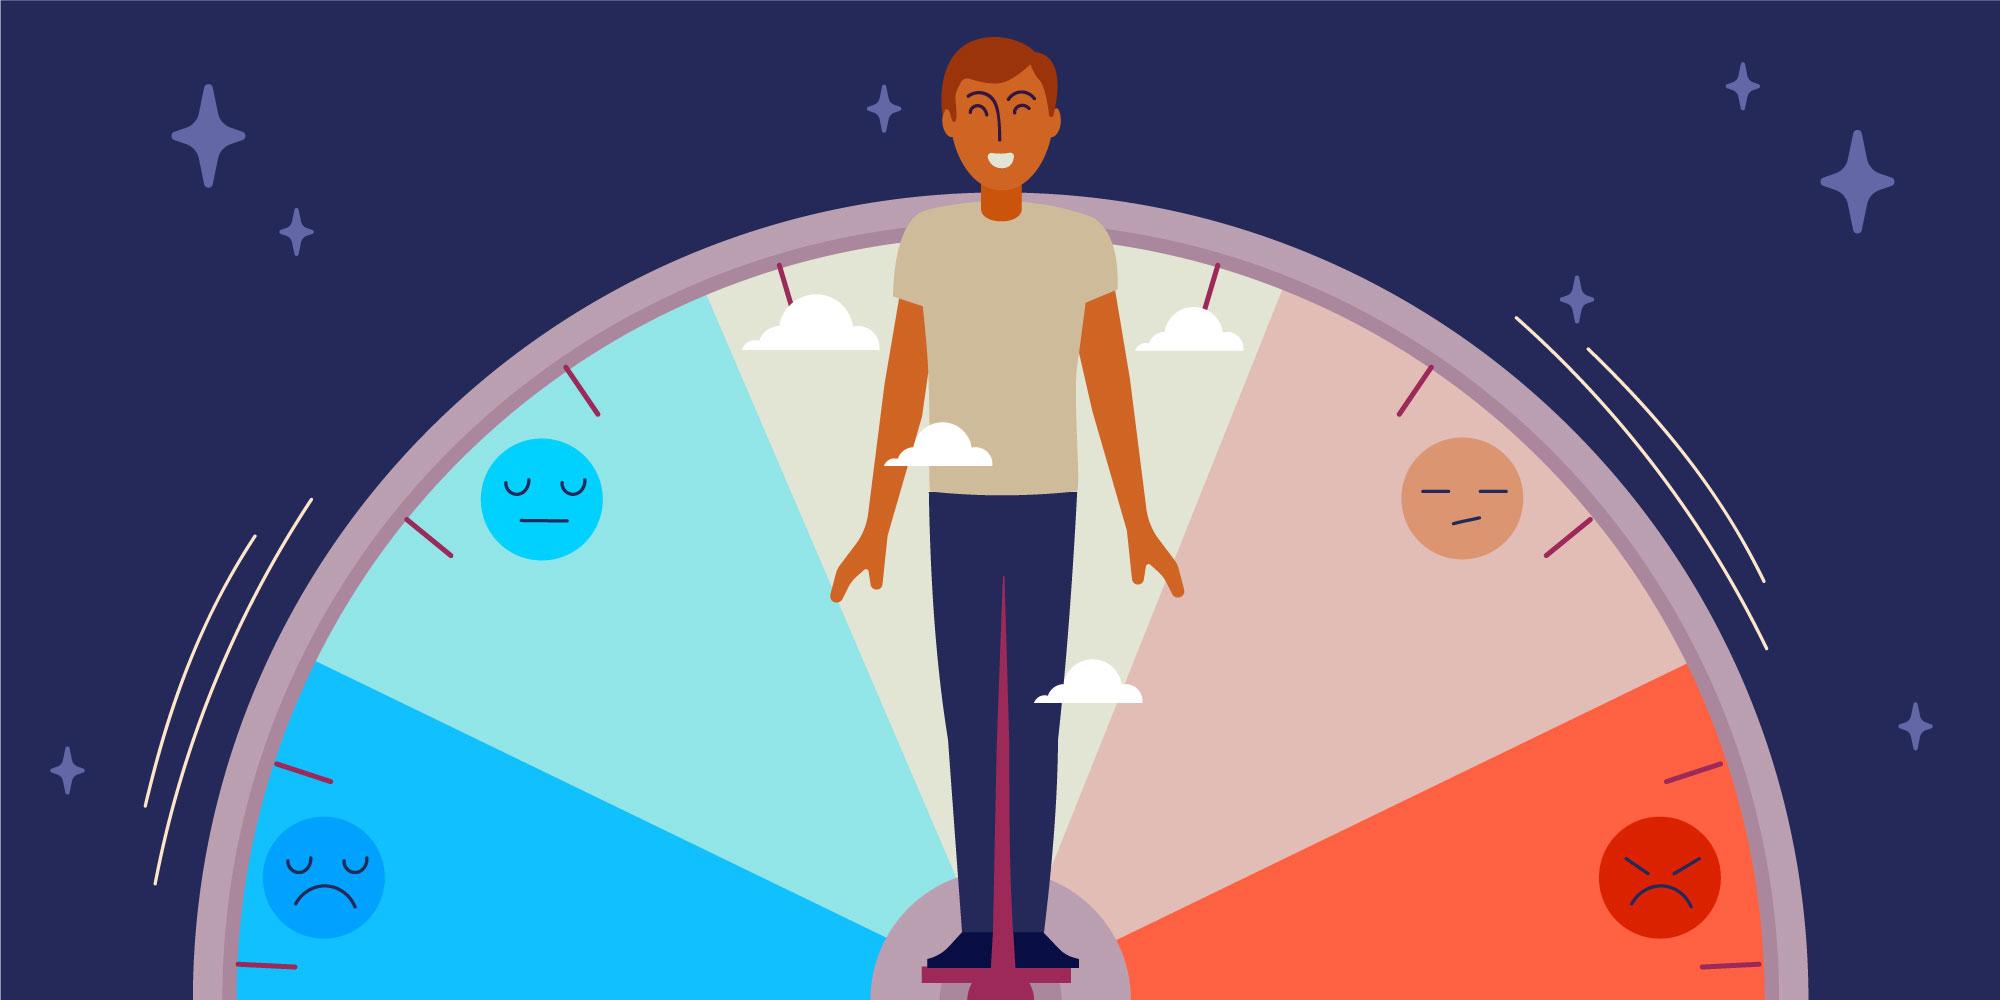 Bringing Balance to a Bipolar Life